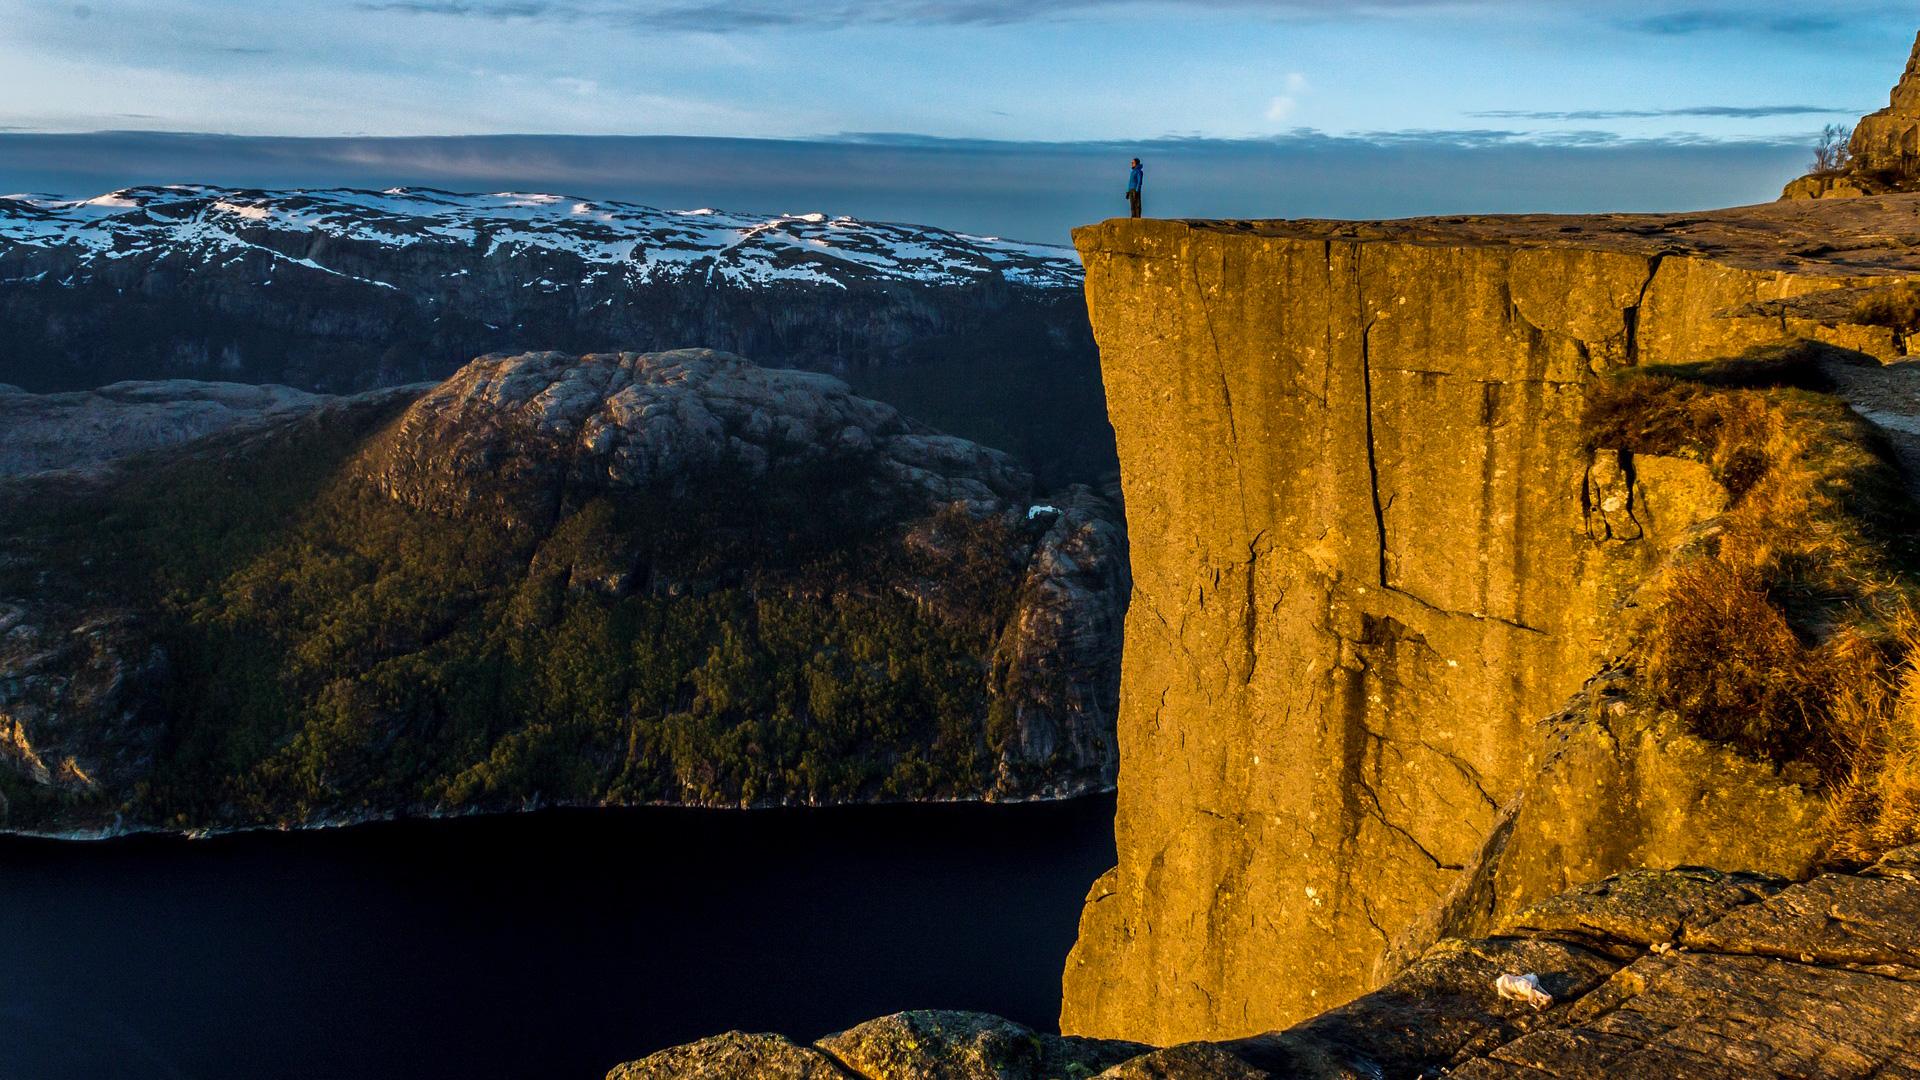 Wandern in den Fjorden Norwegens – Eine atemberaubende Szenerie erleben